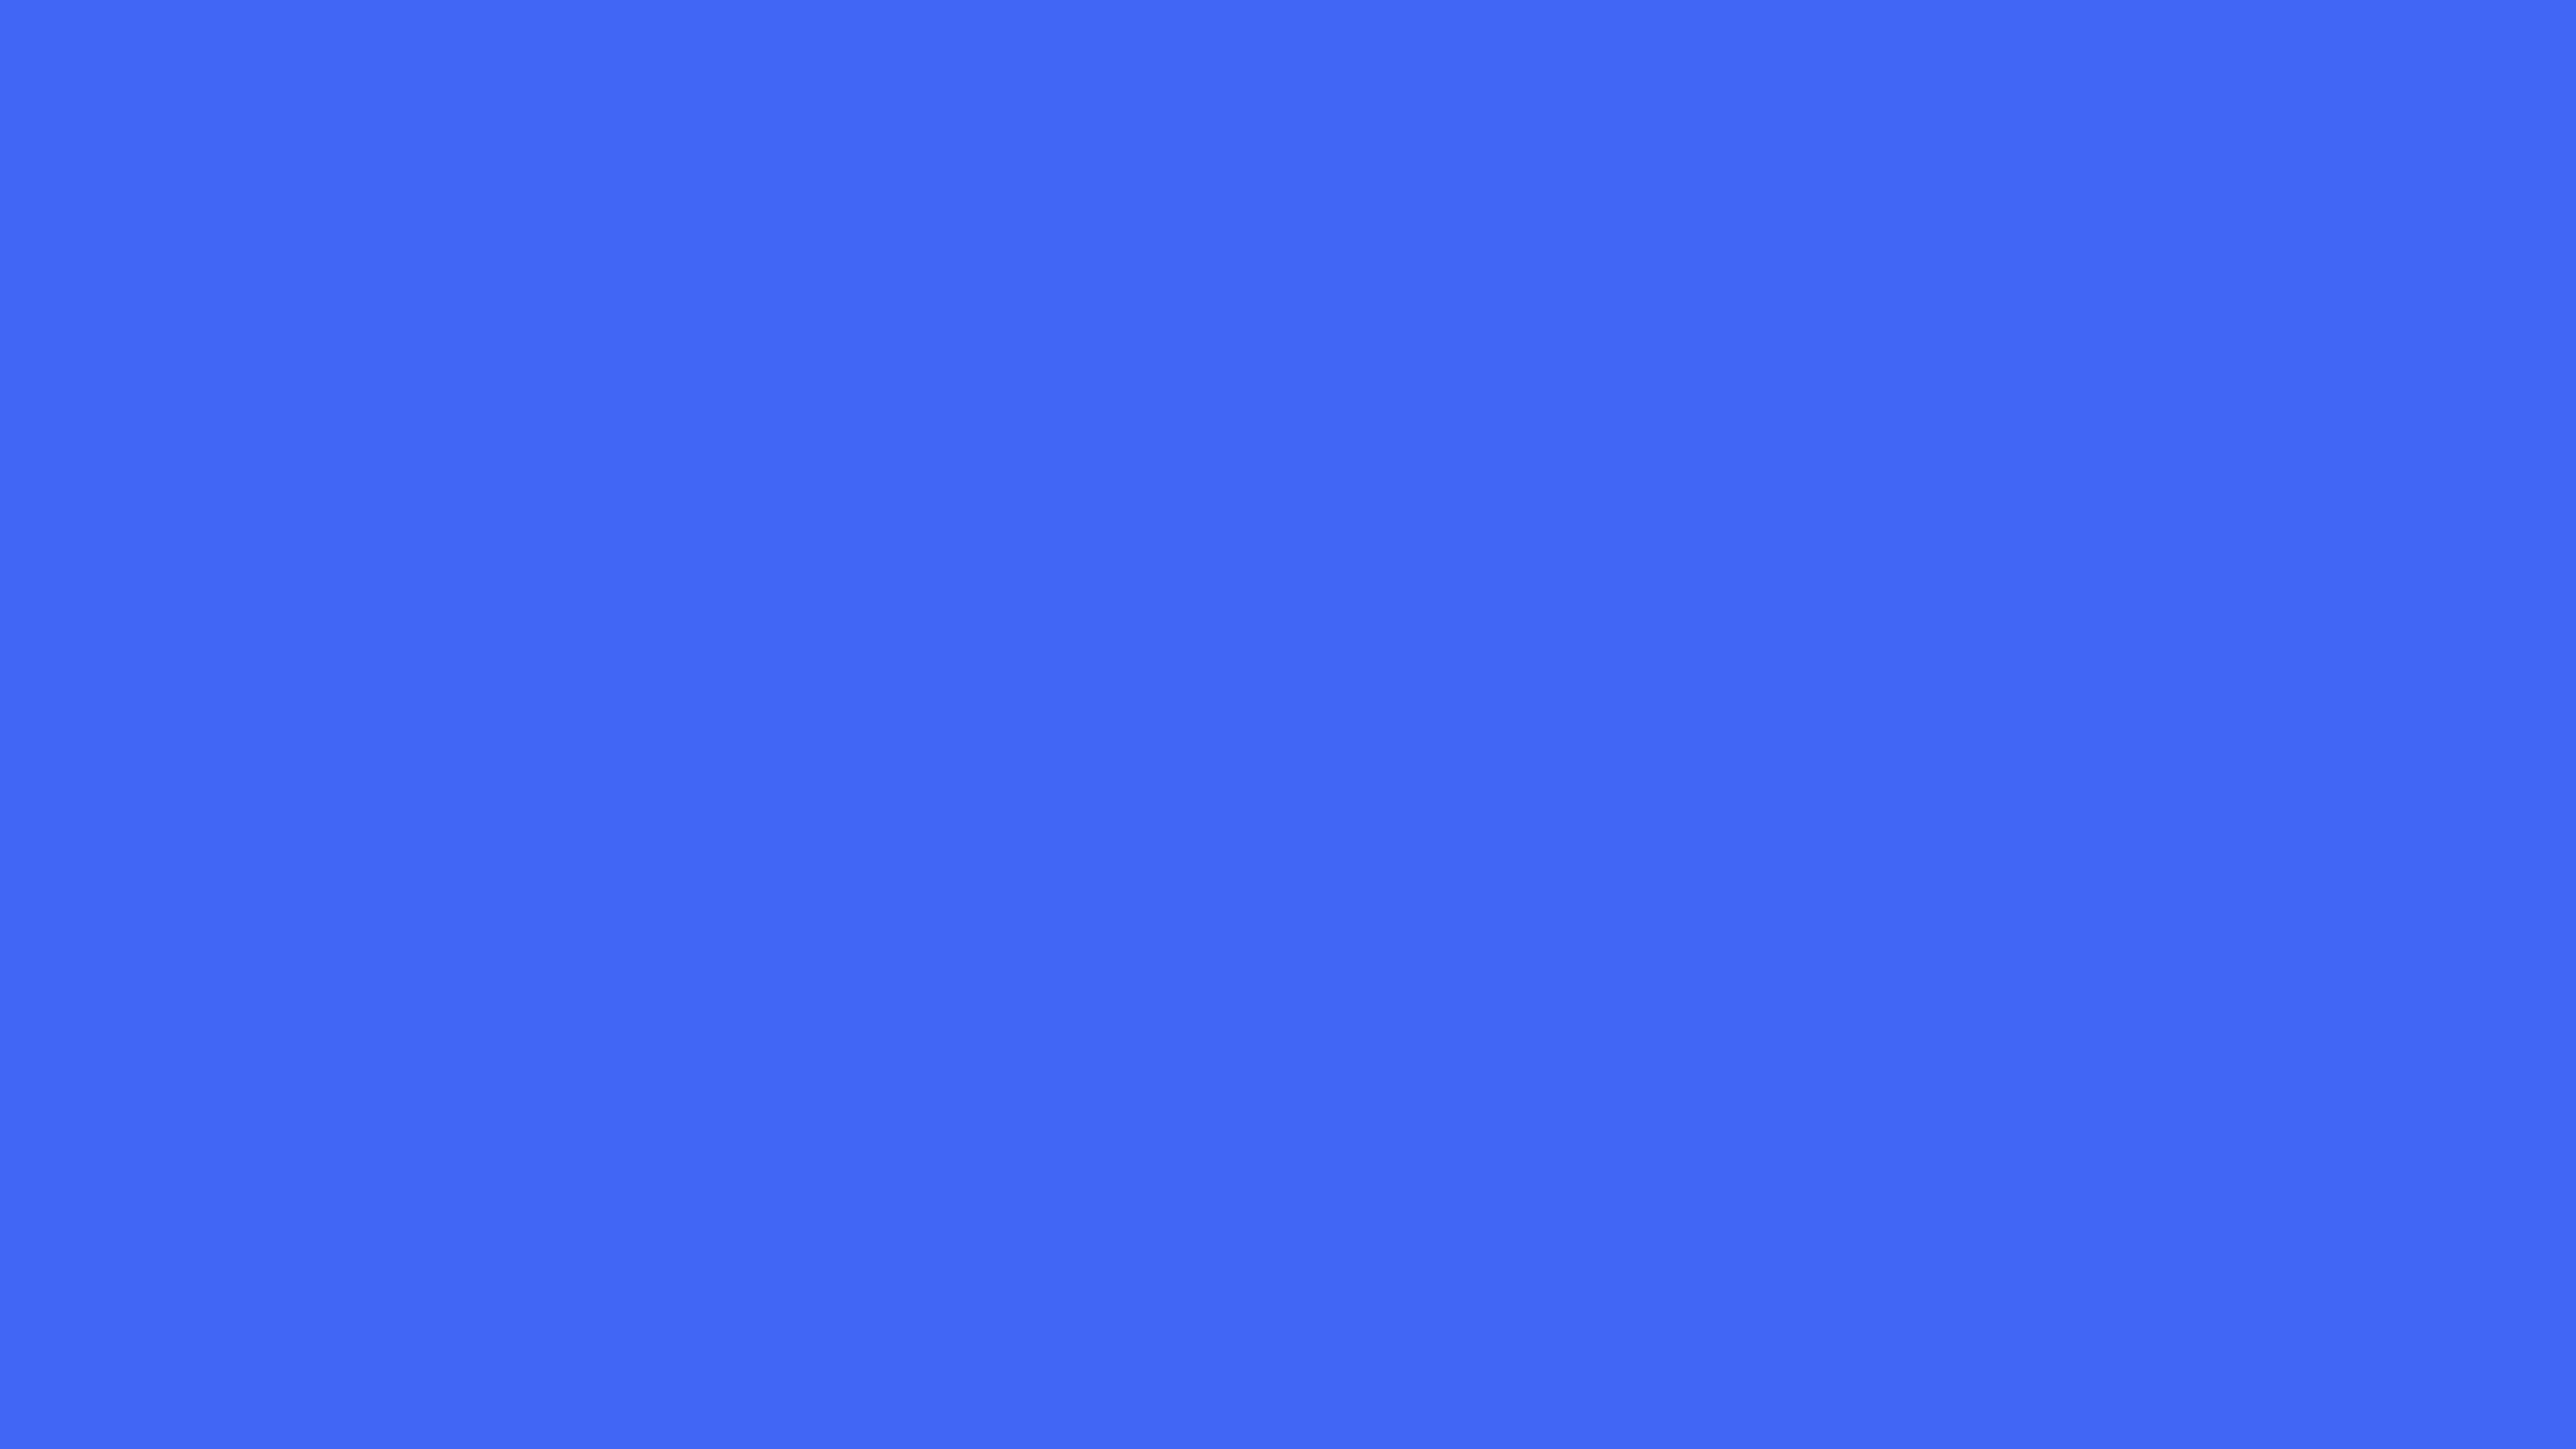 4096x2304 Ultramarine Blue Solid Color Background